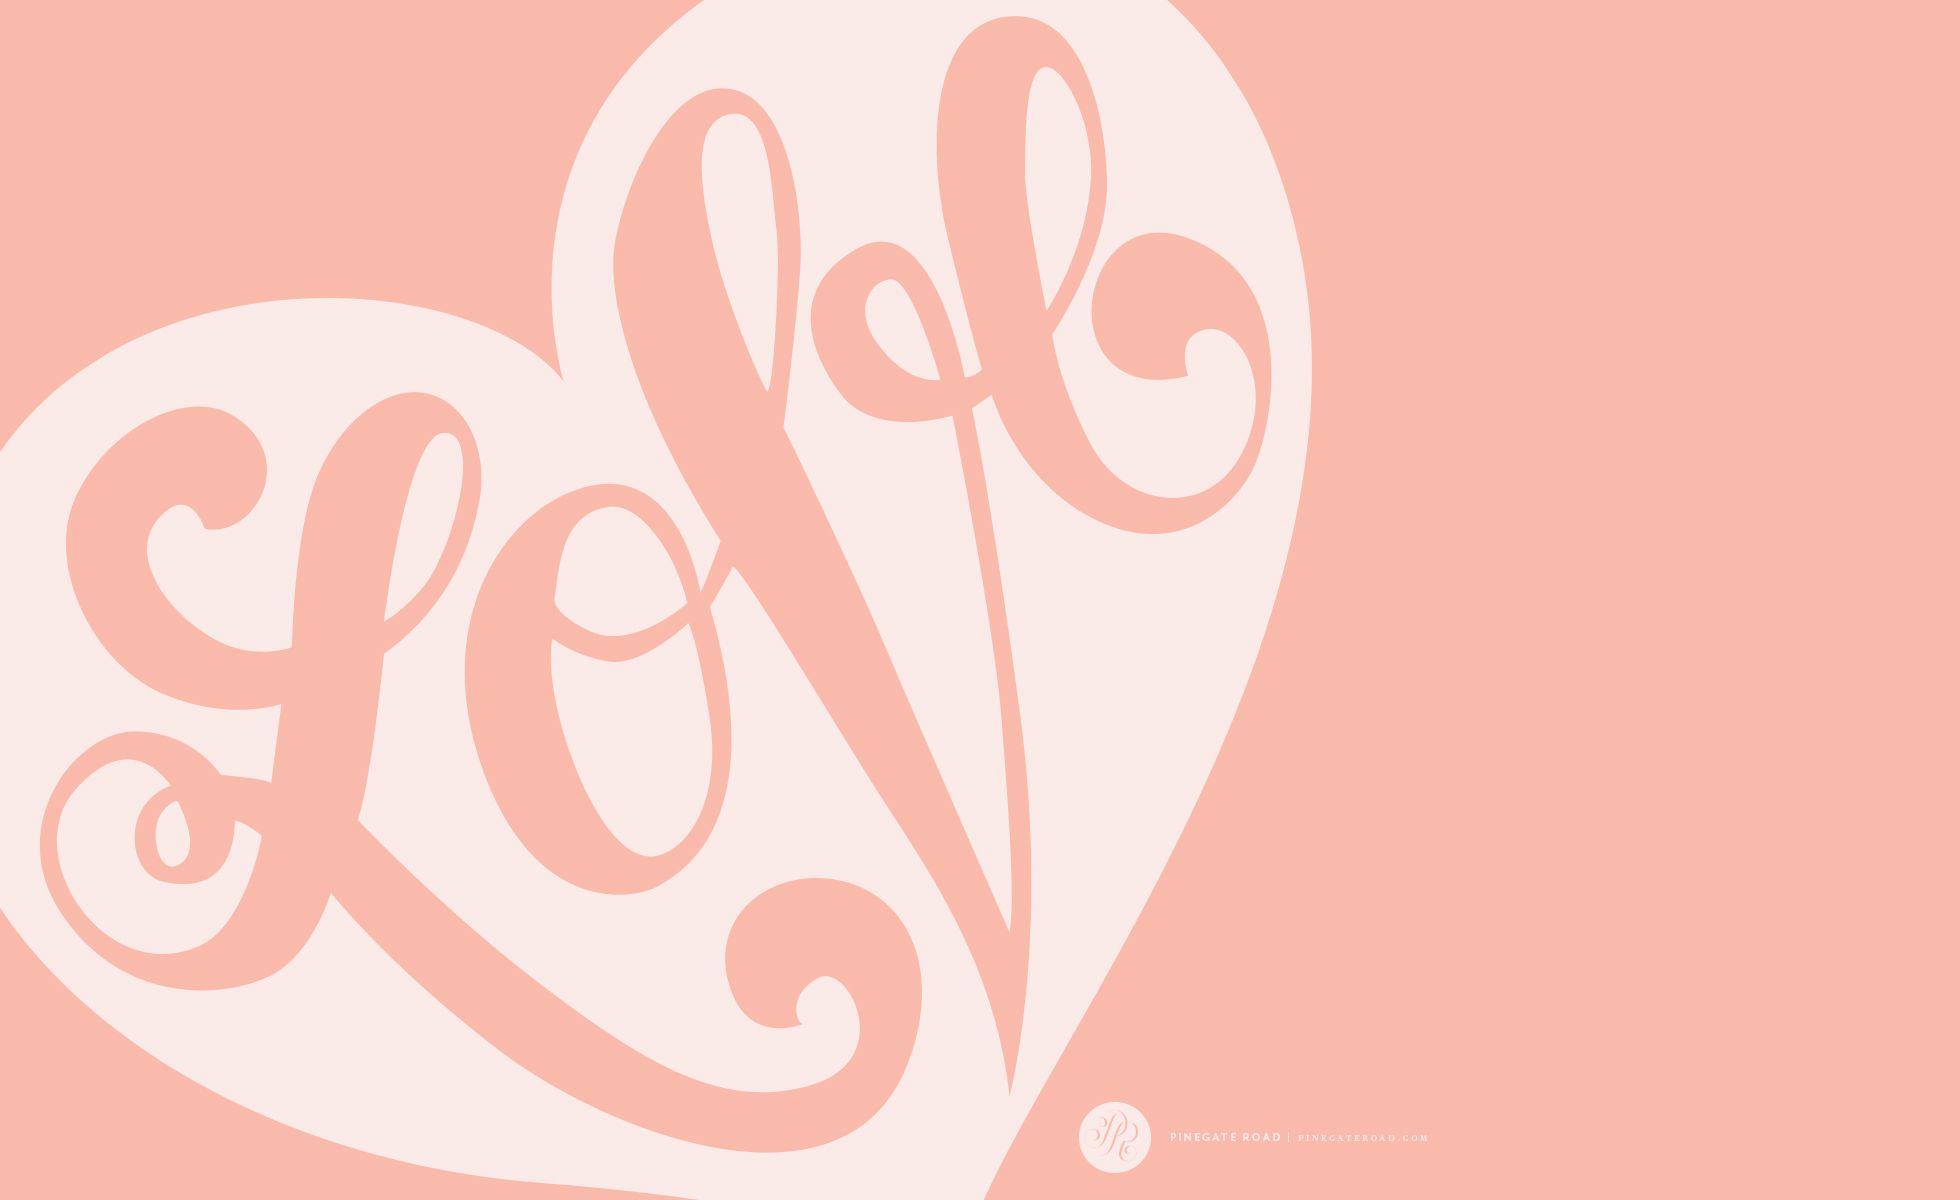 Valentines-Day-Love-desktop-wallpaper-Pinegate-Road ...